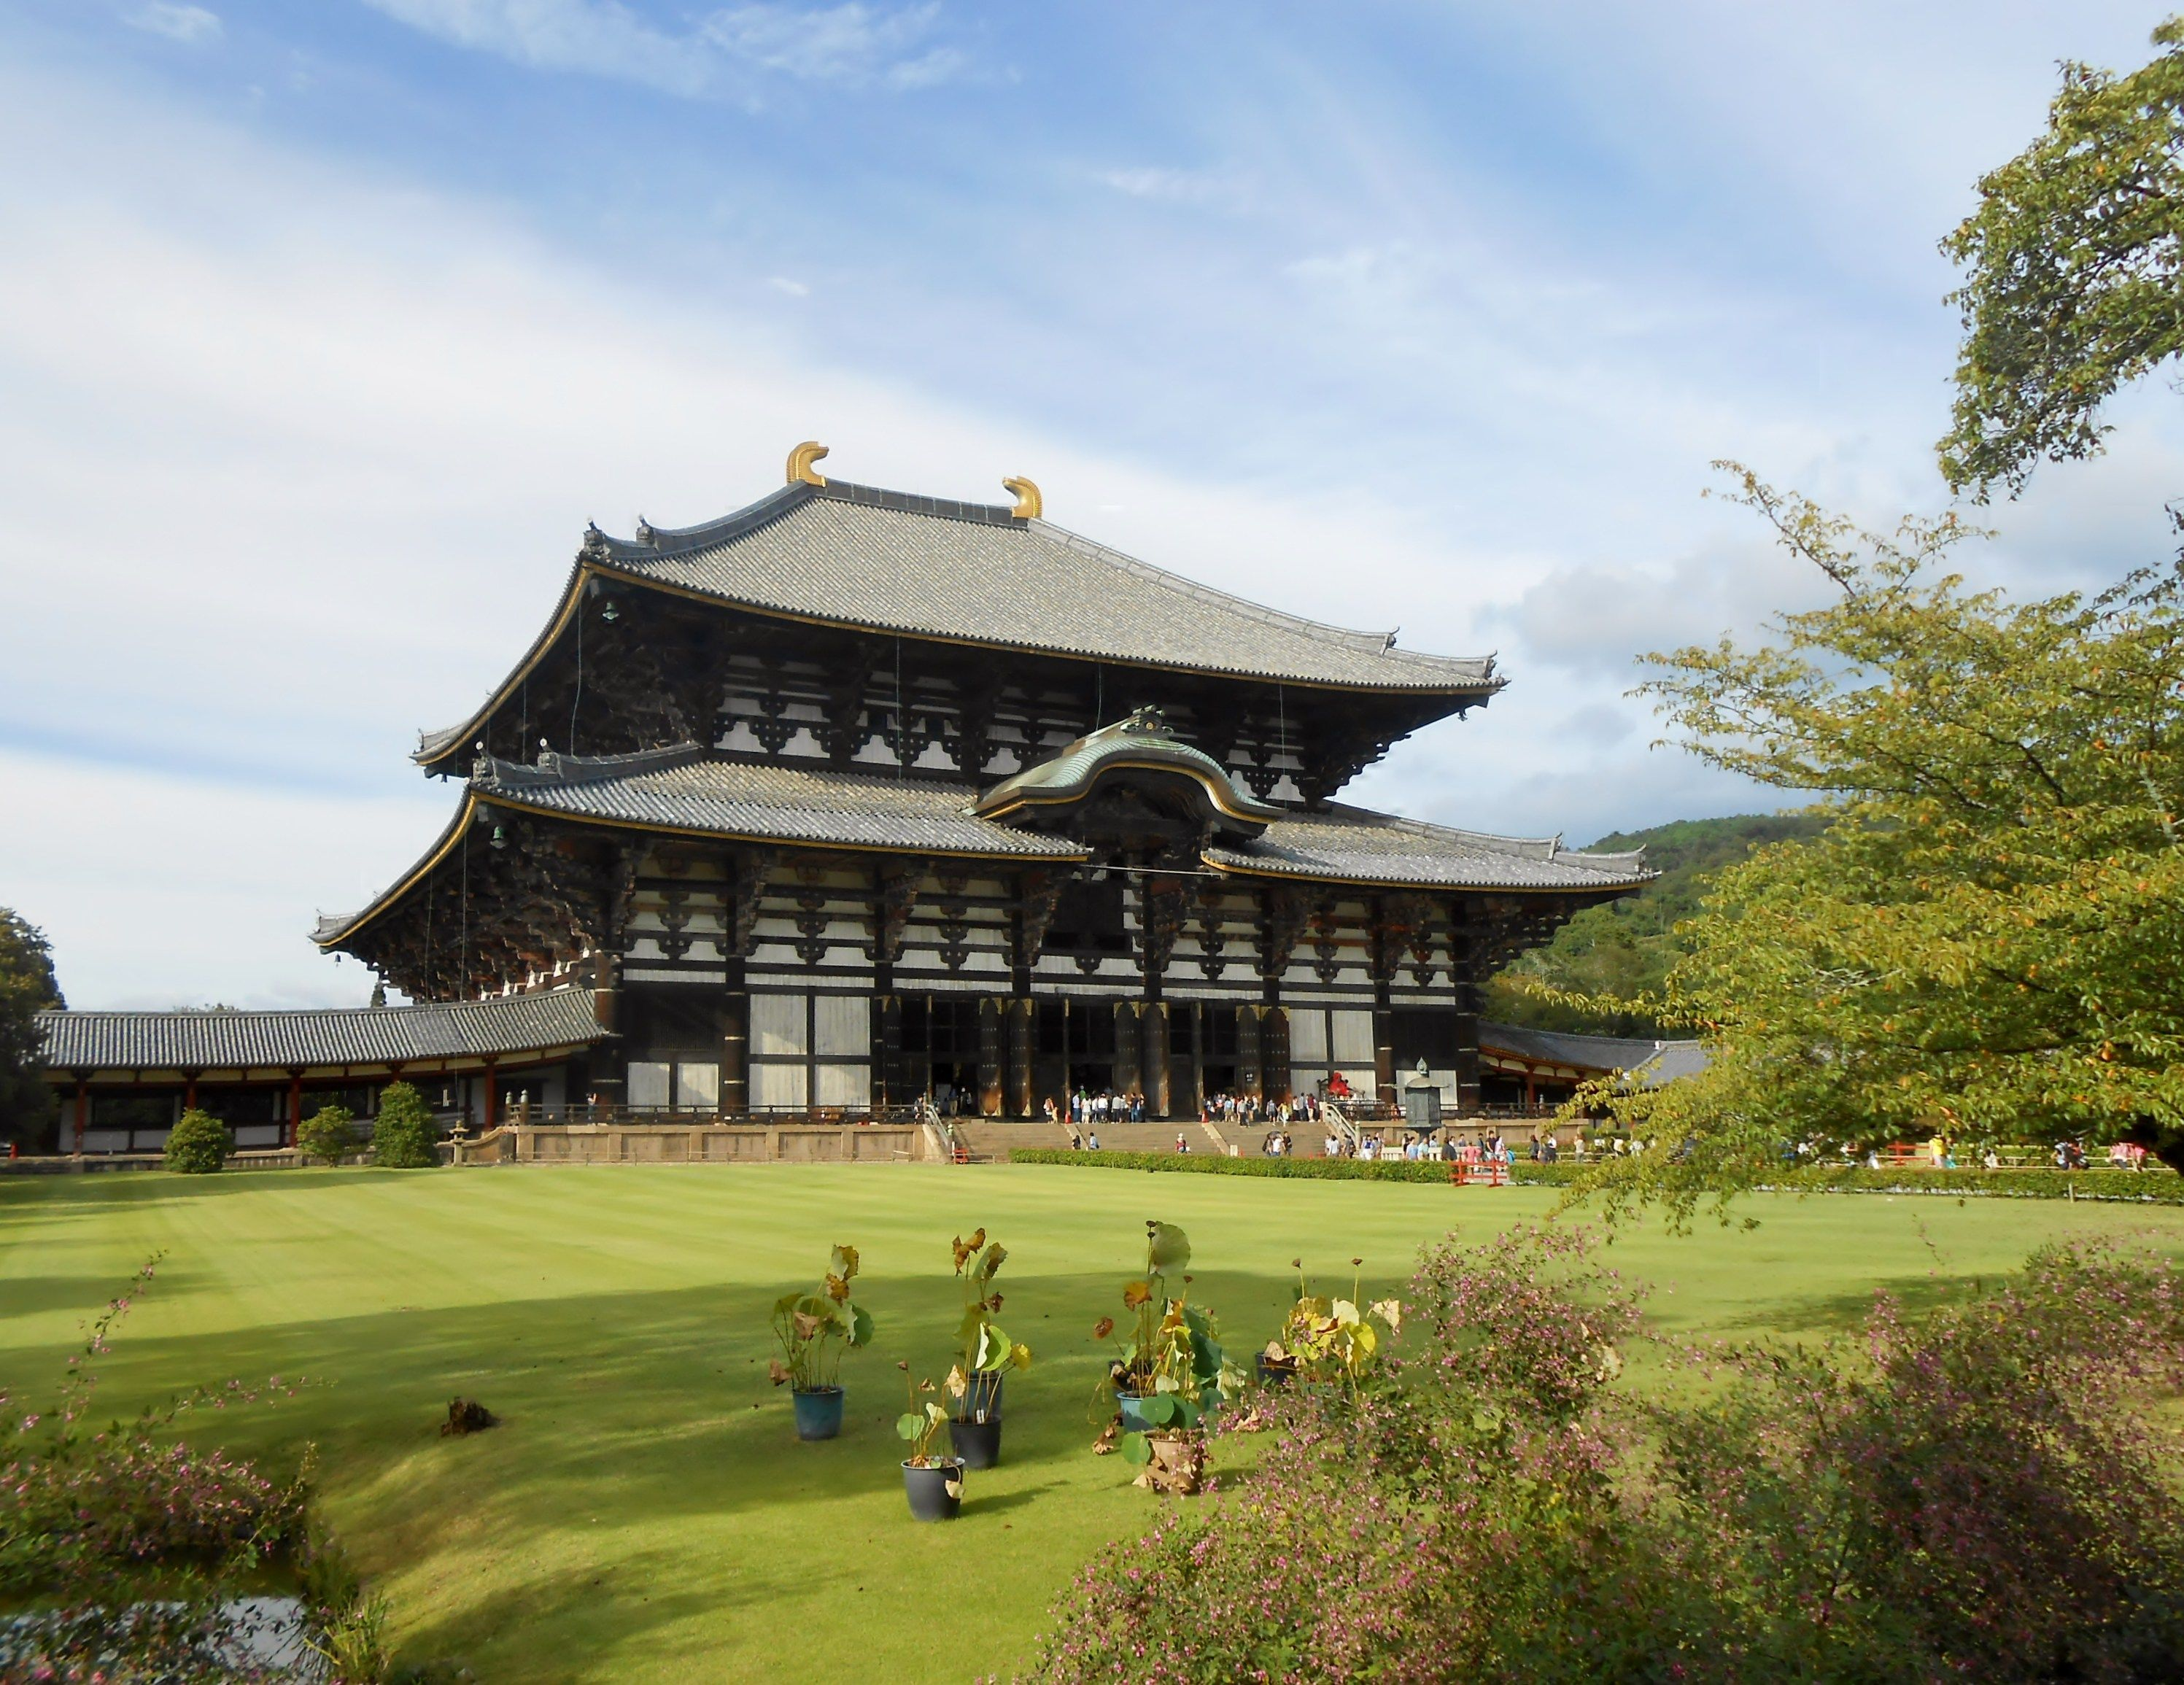 The great buddha temple of Nara, Todaiji